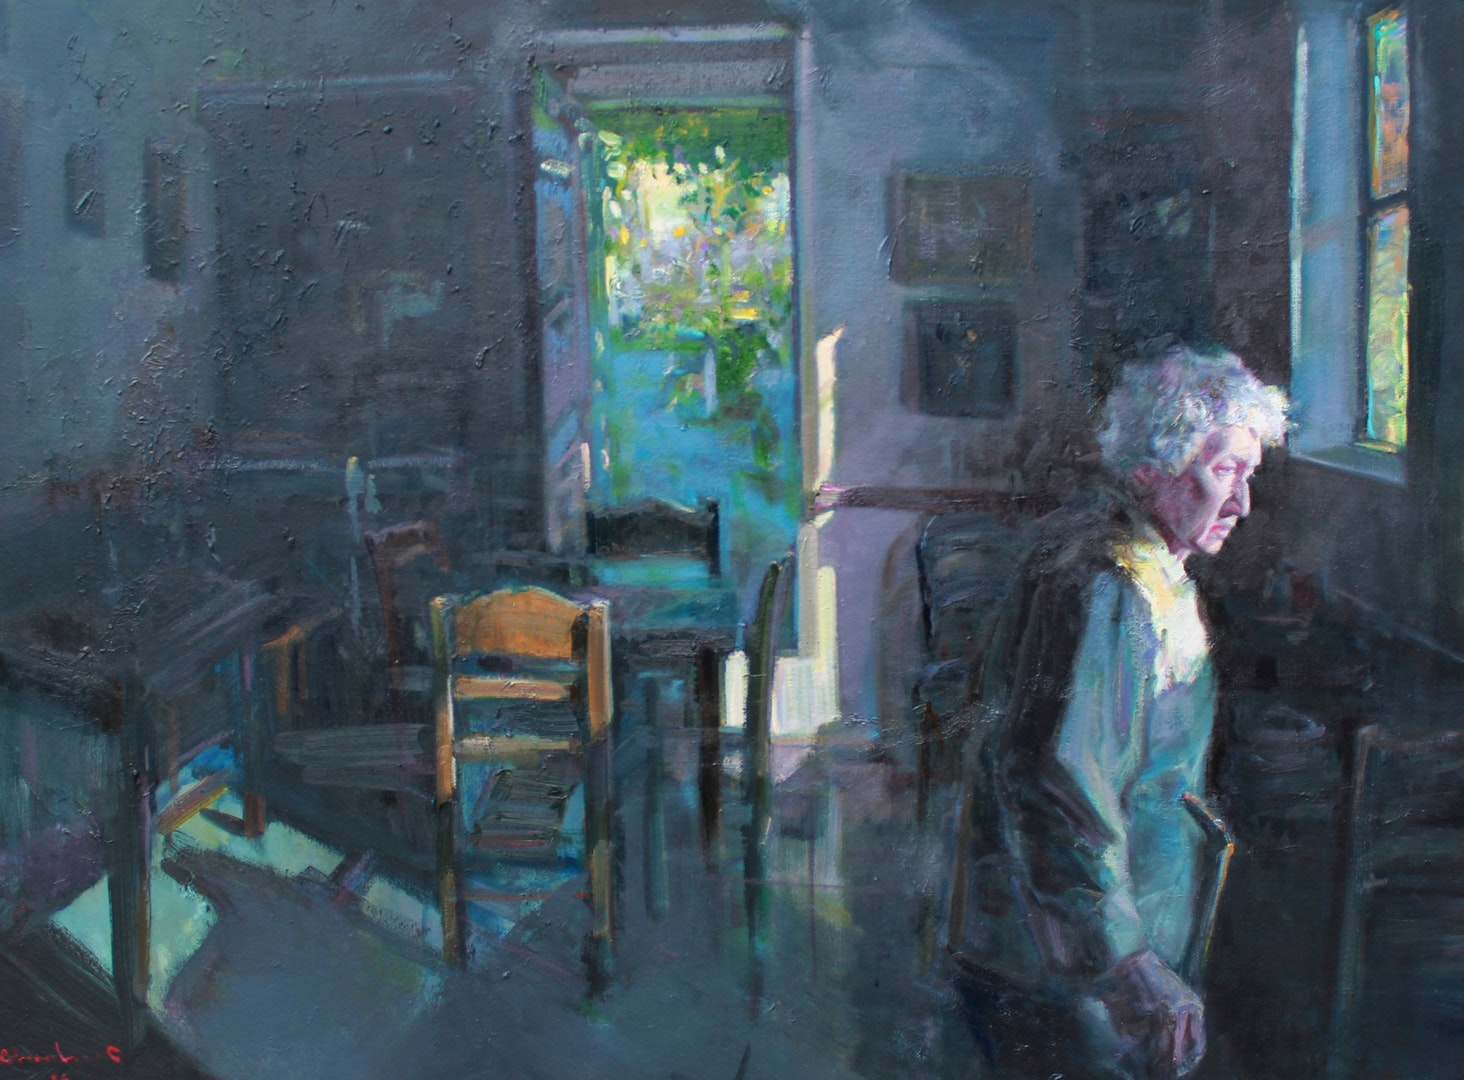 'Isolation 3', Charles Choi, Oil on canvas, 130 x 100 cm